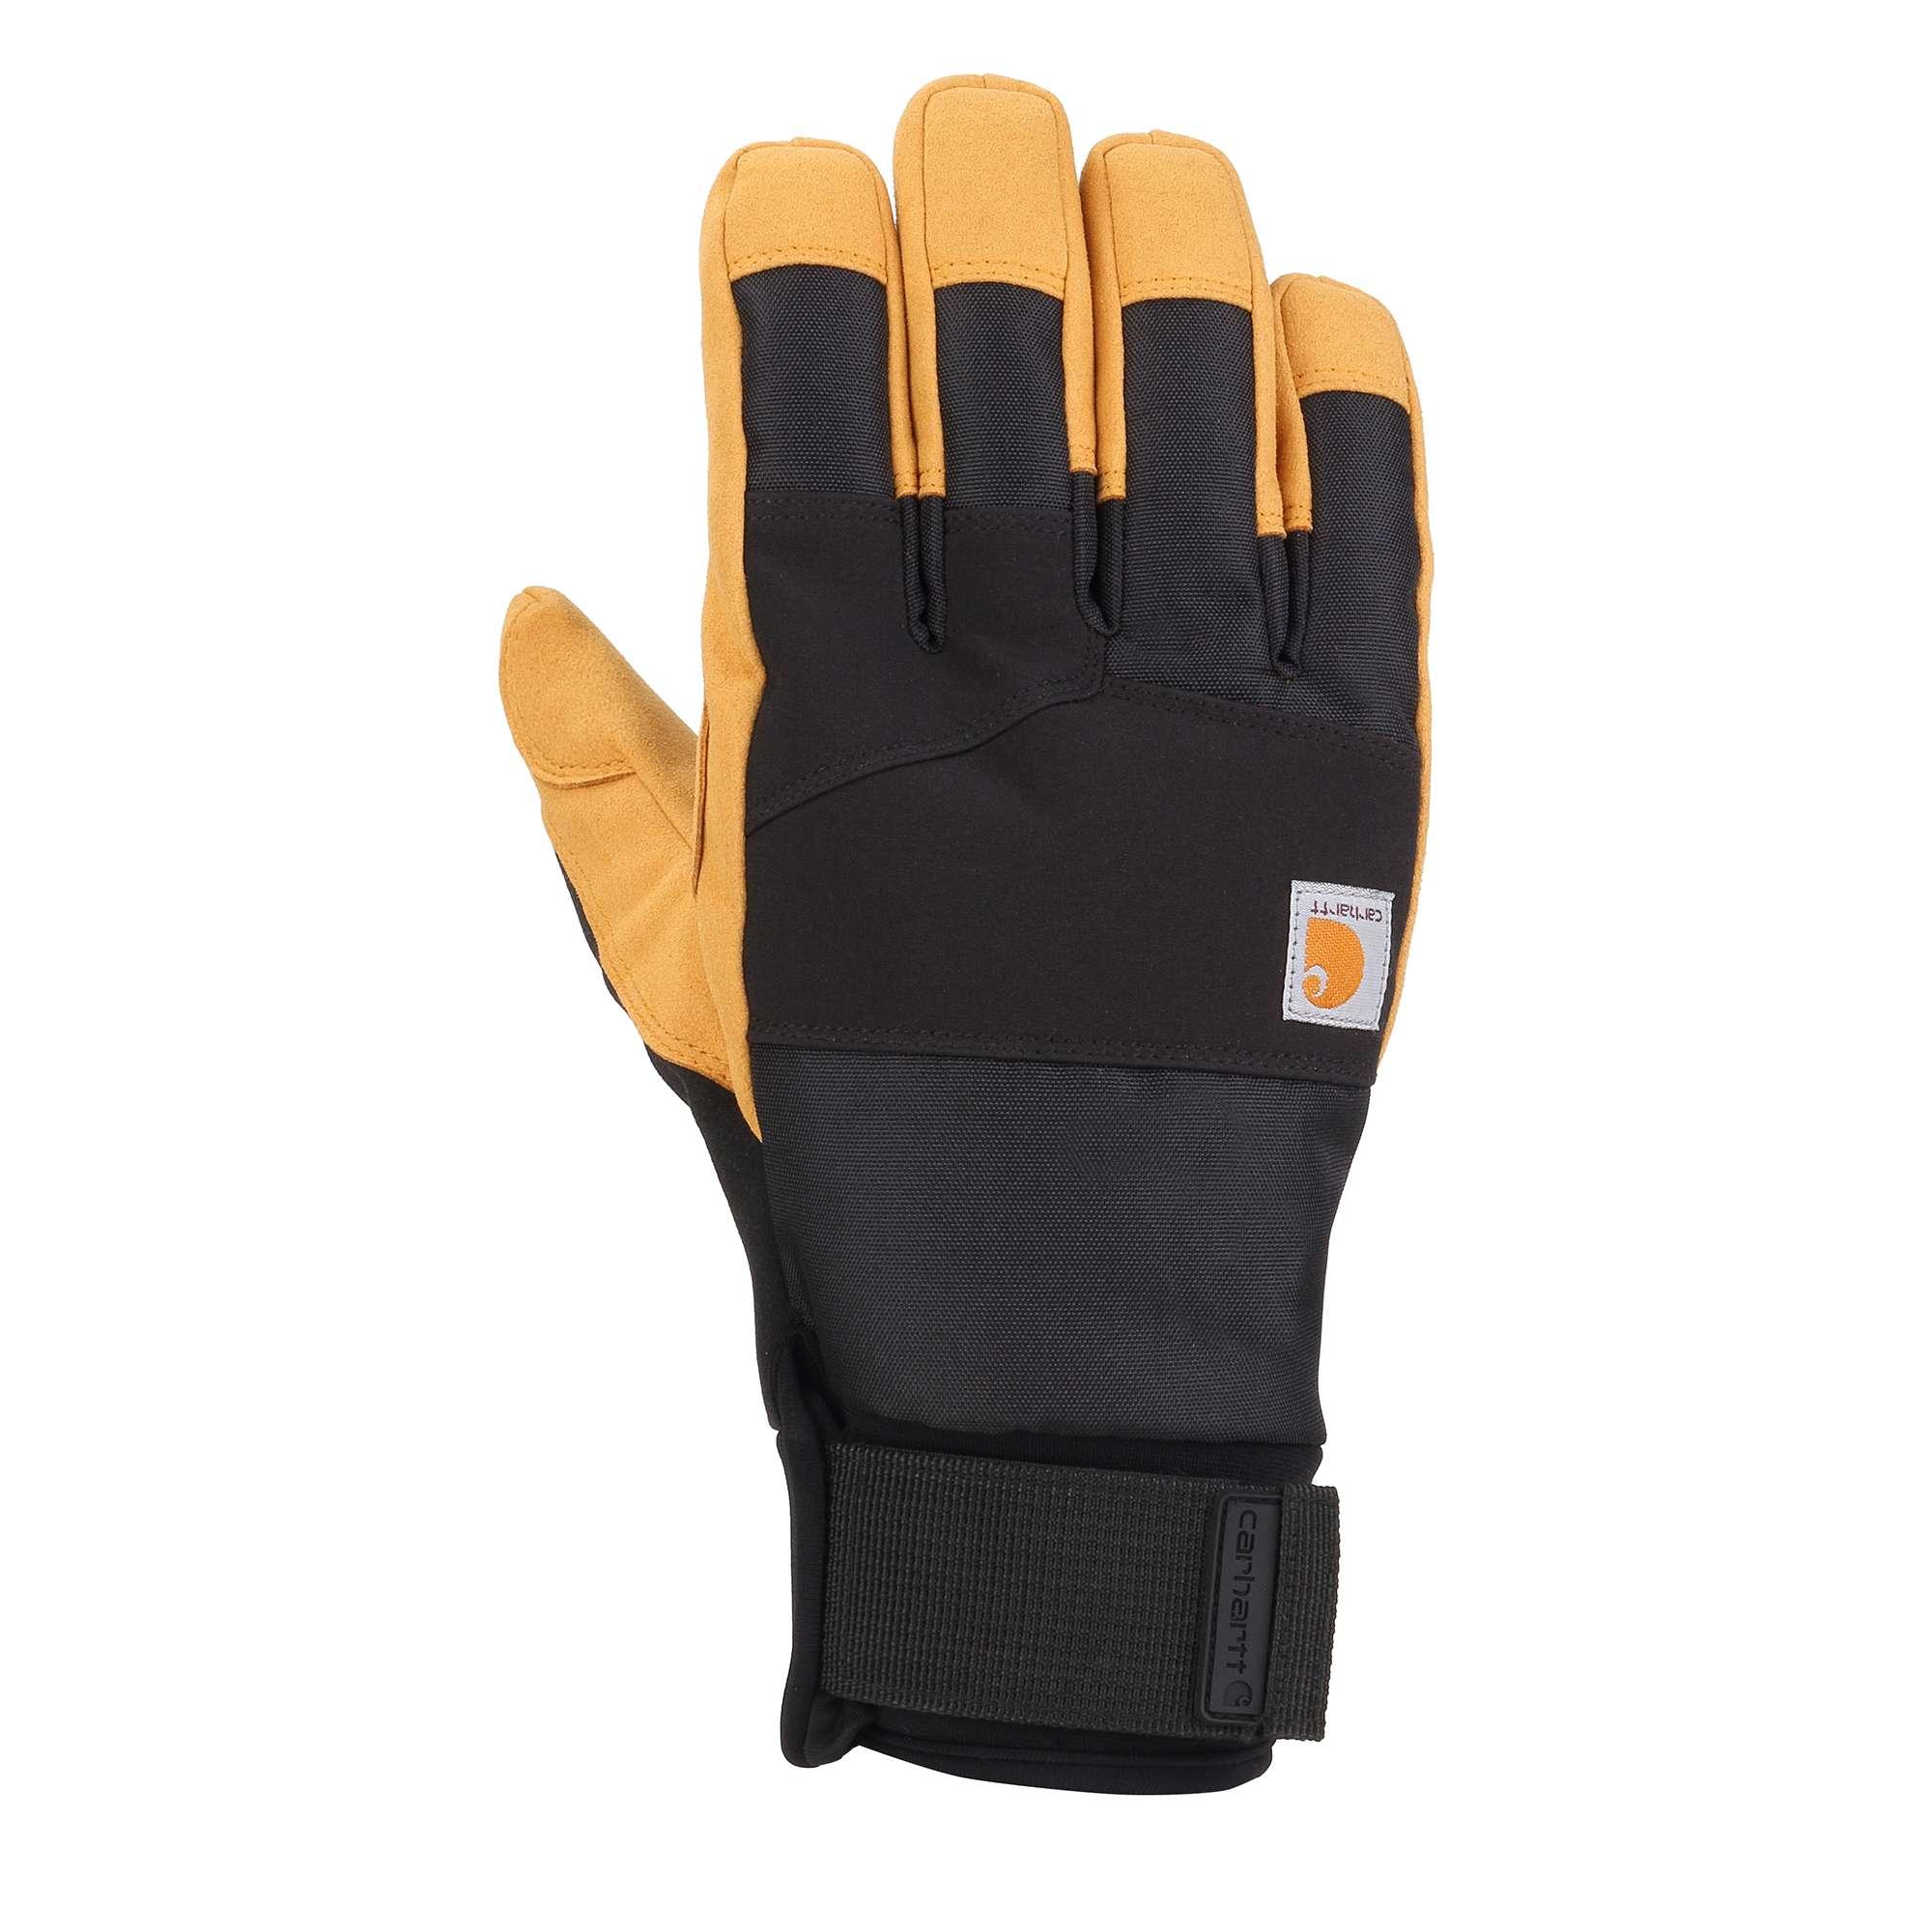 Carhartt Stoker Insulated Glove